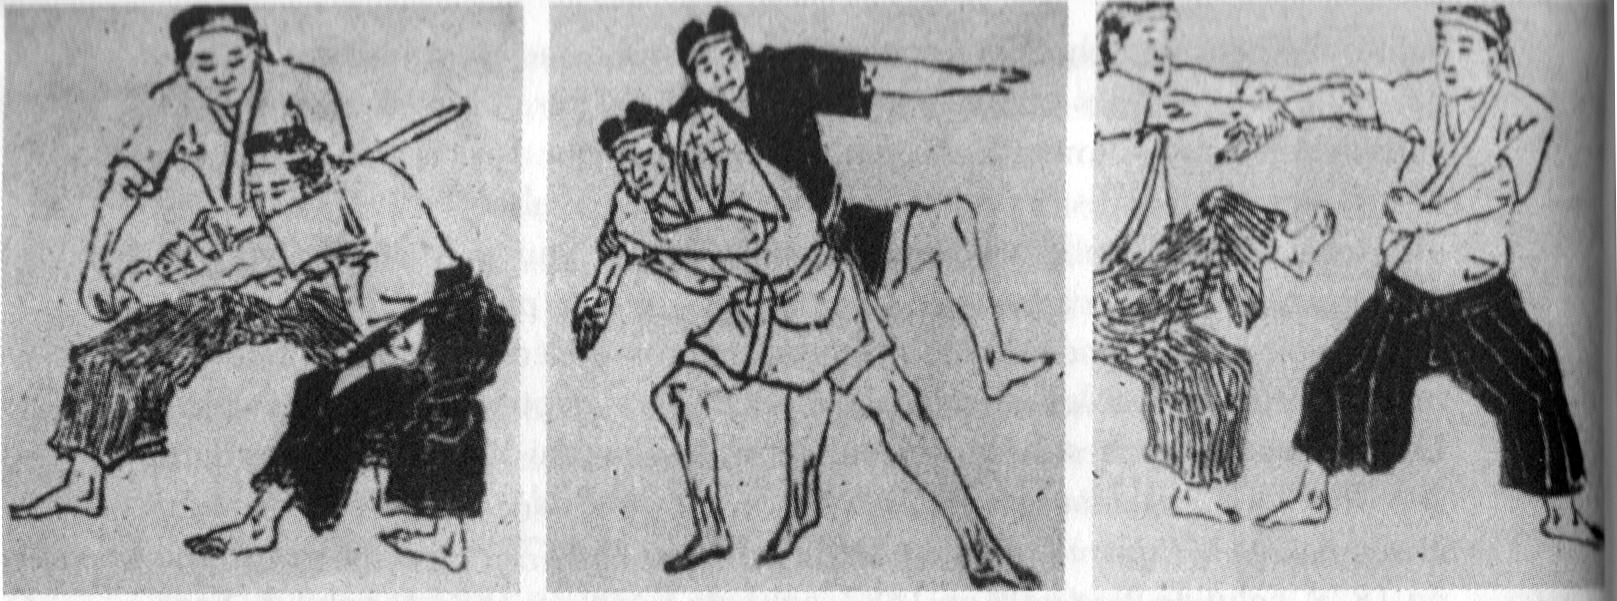 Anciennes prises jujitsu